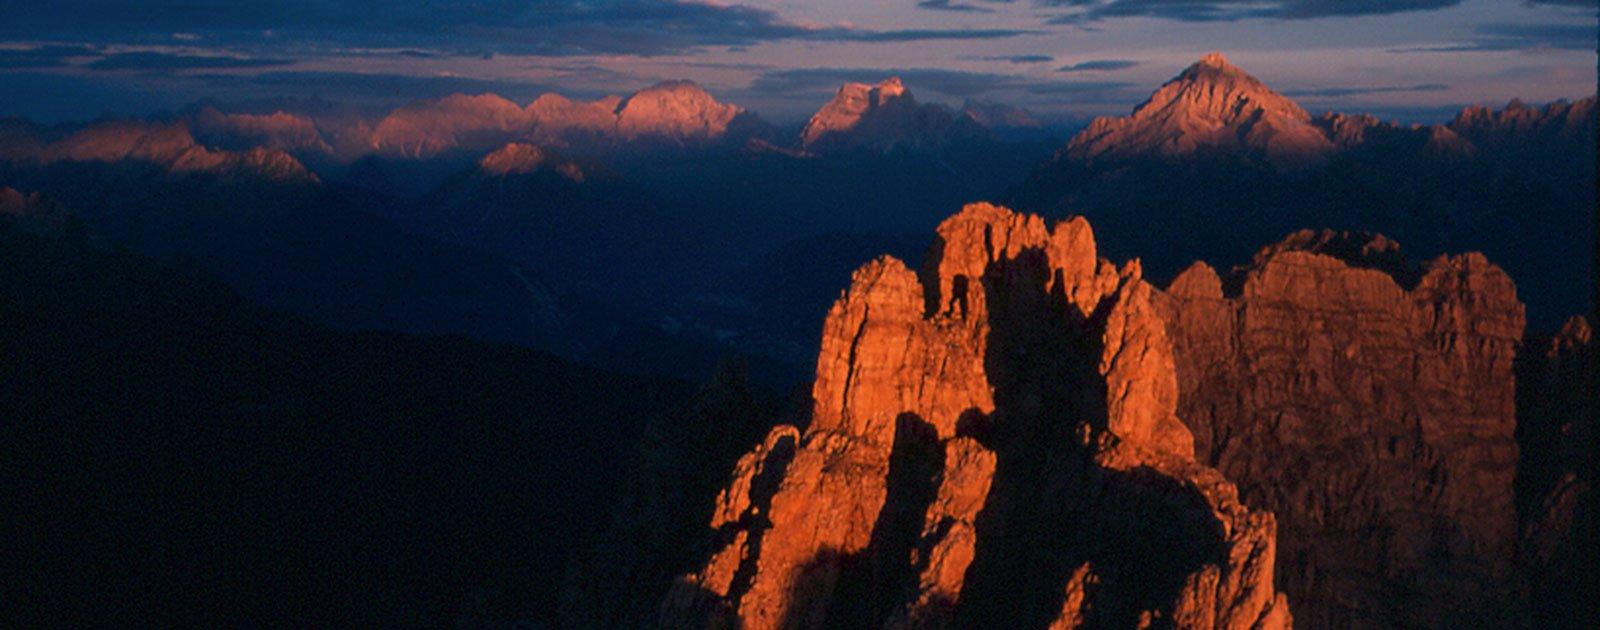 Sonnenuntergang im Sommer in den Dolomiten